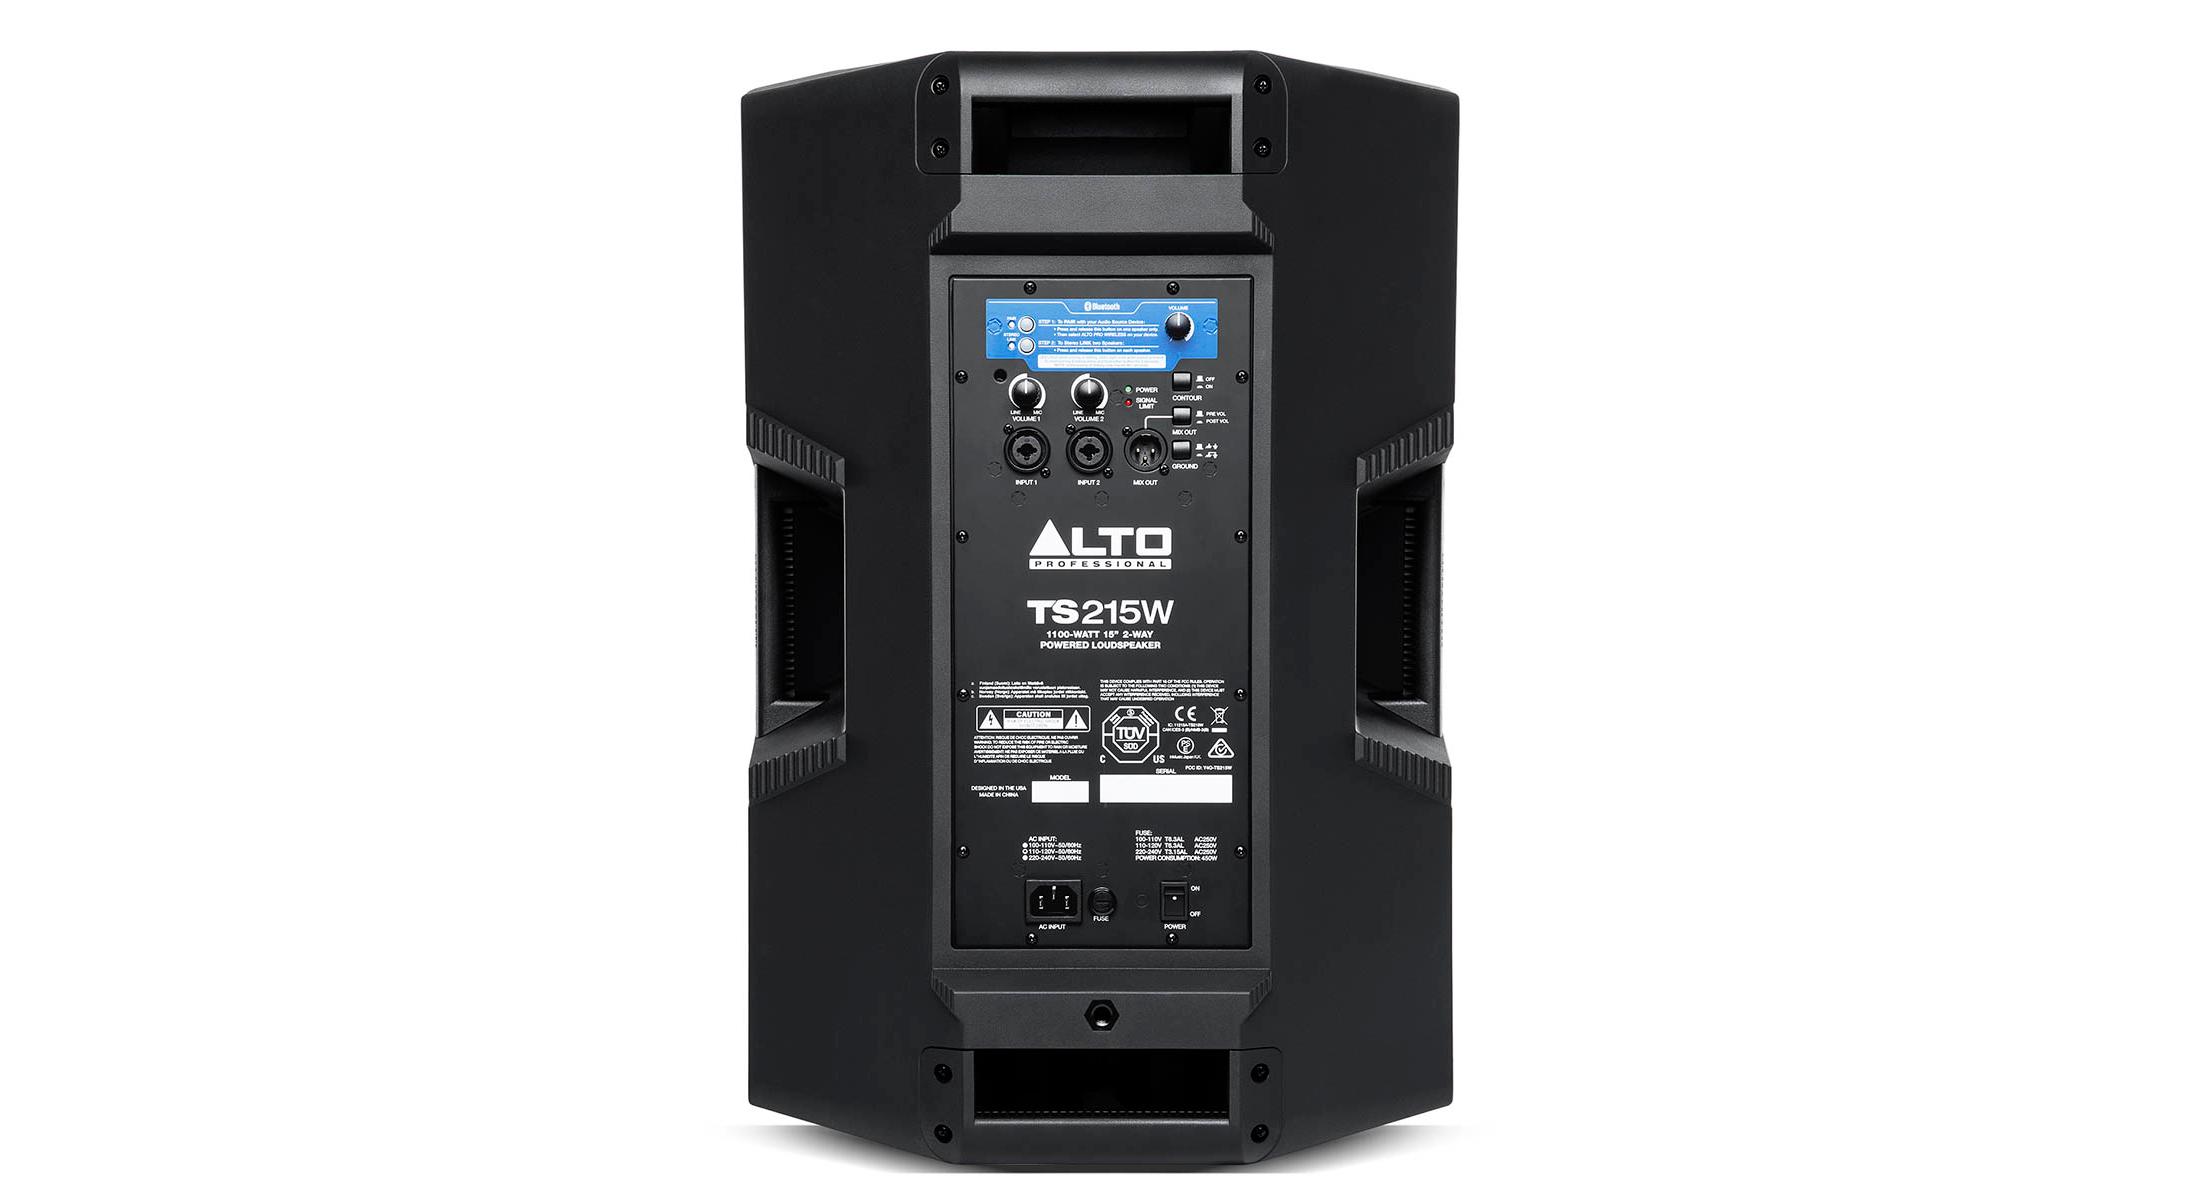 Alto-TS215W-back.jpg